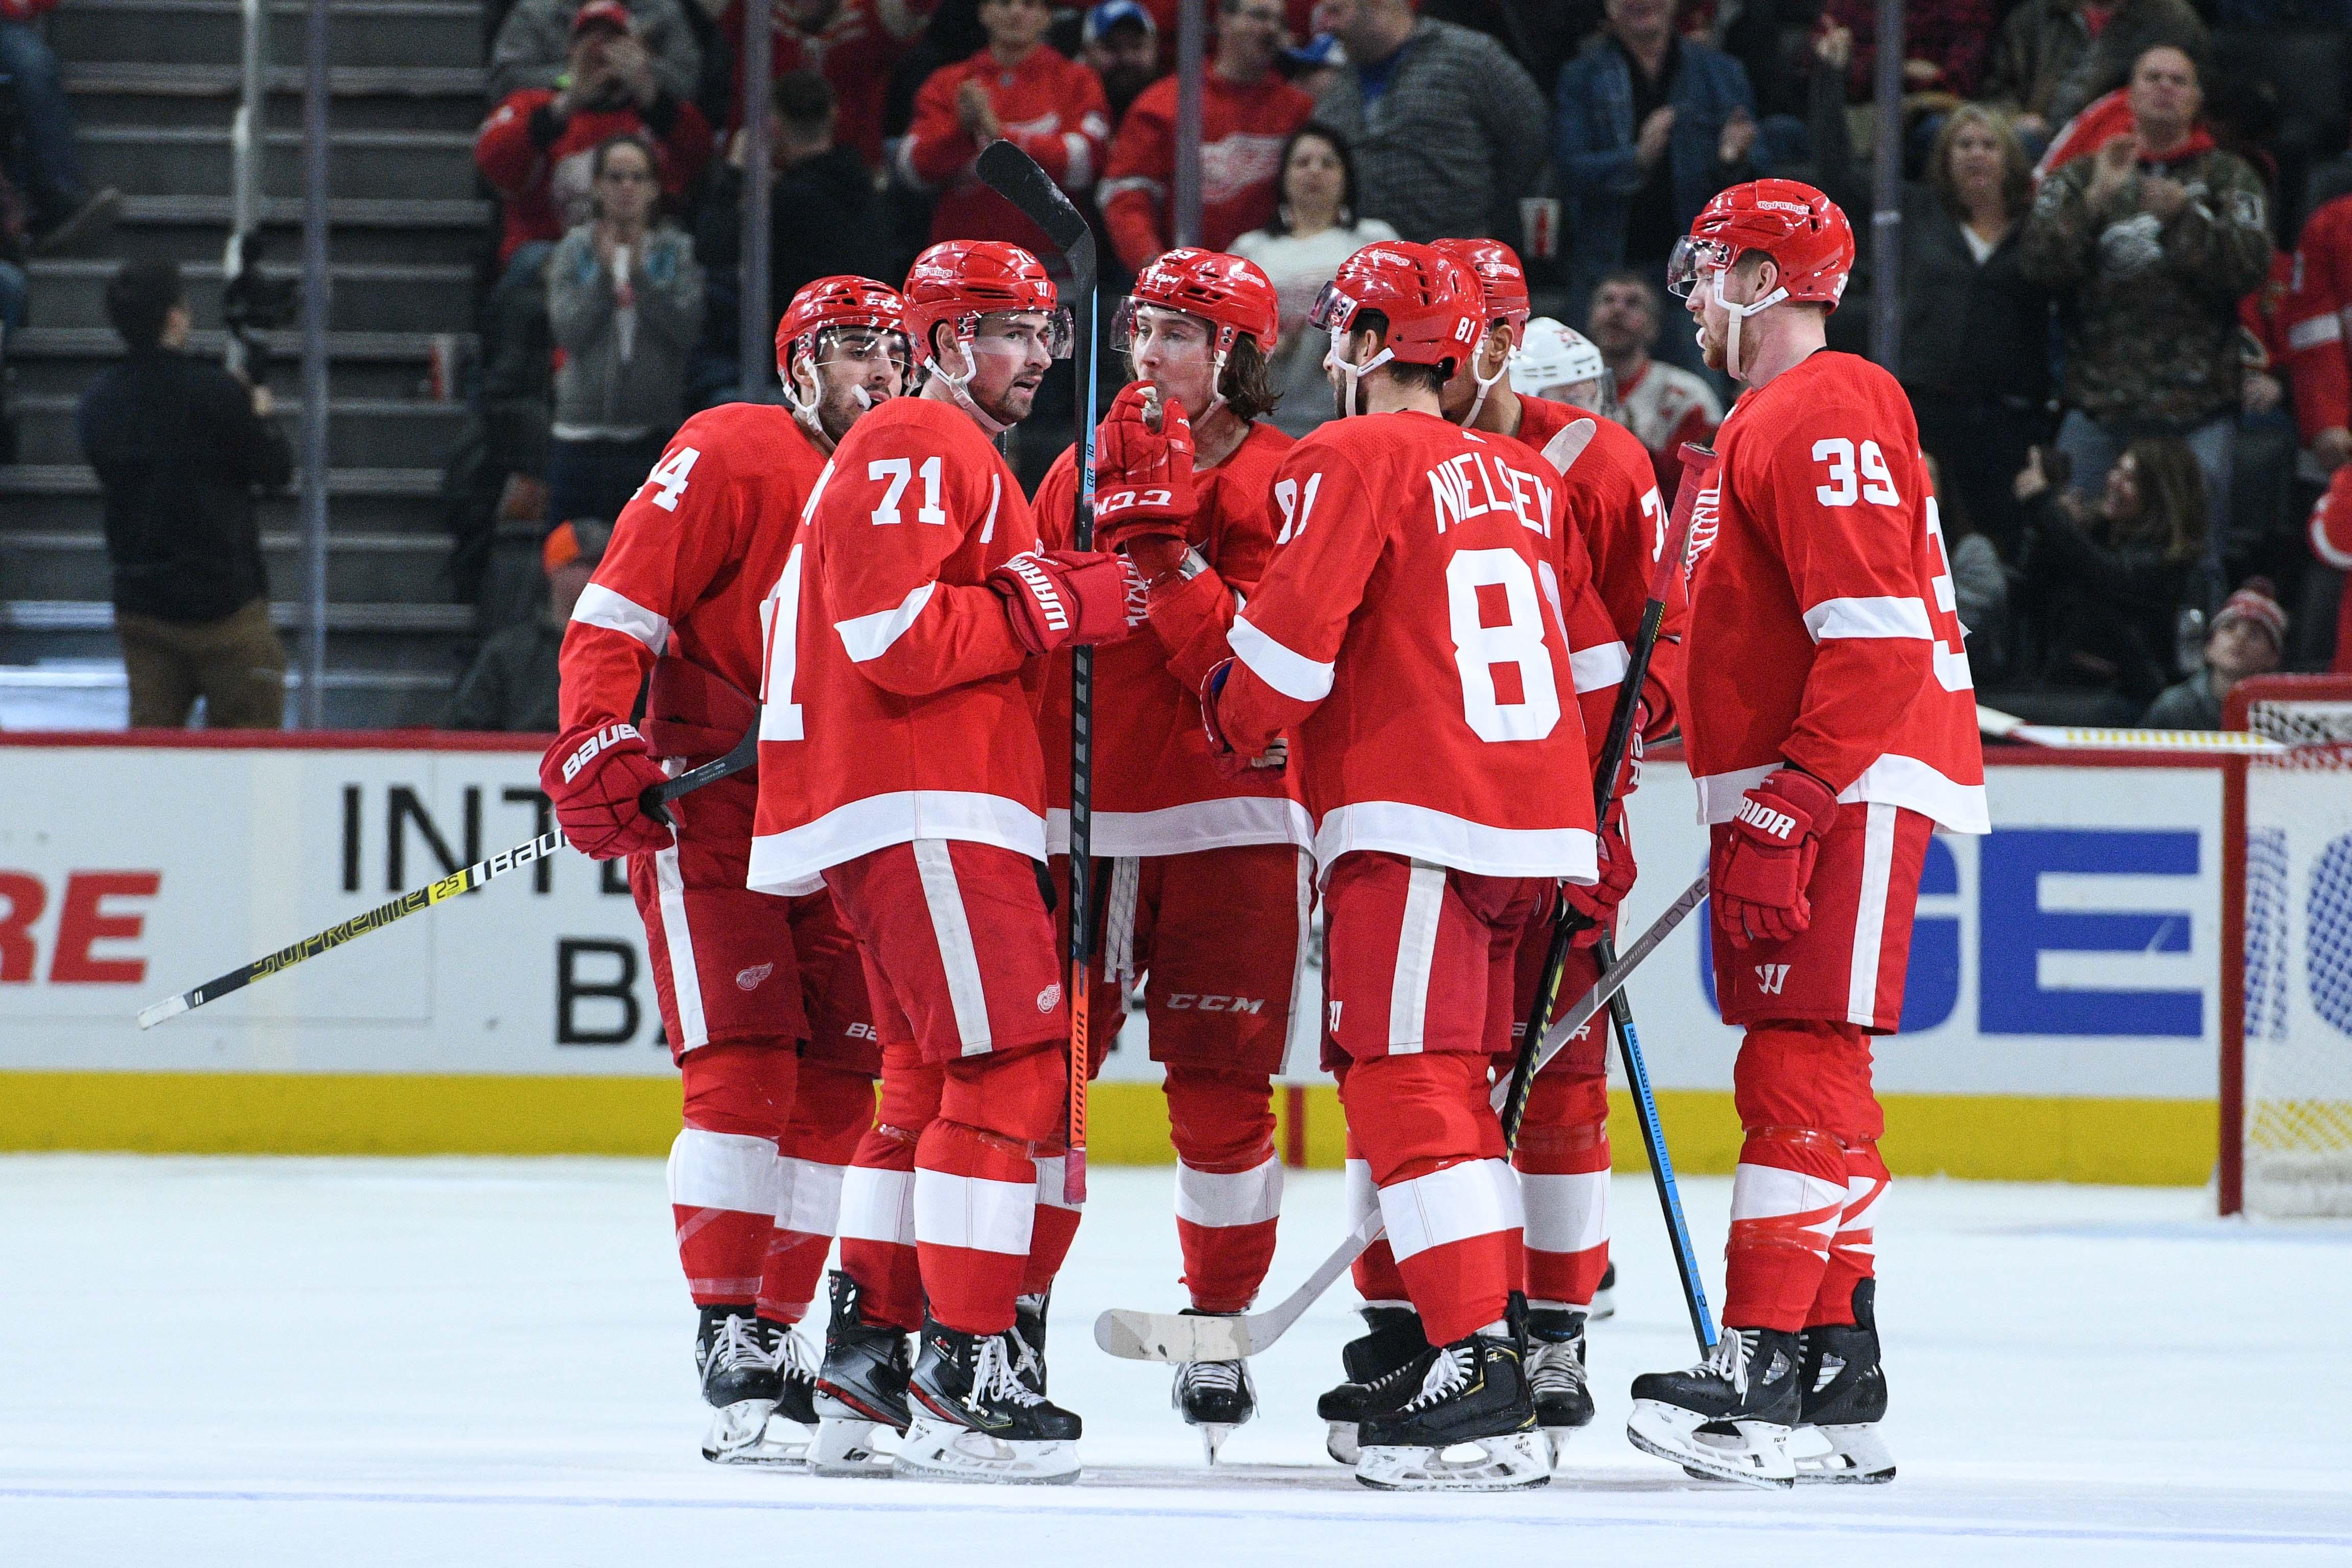 NHL: Calgary Flames at Detroit Red Wings